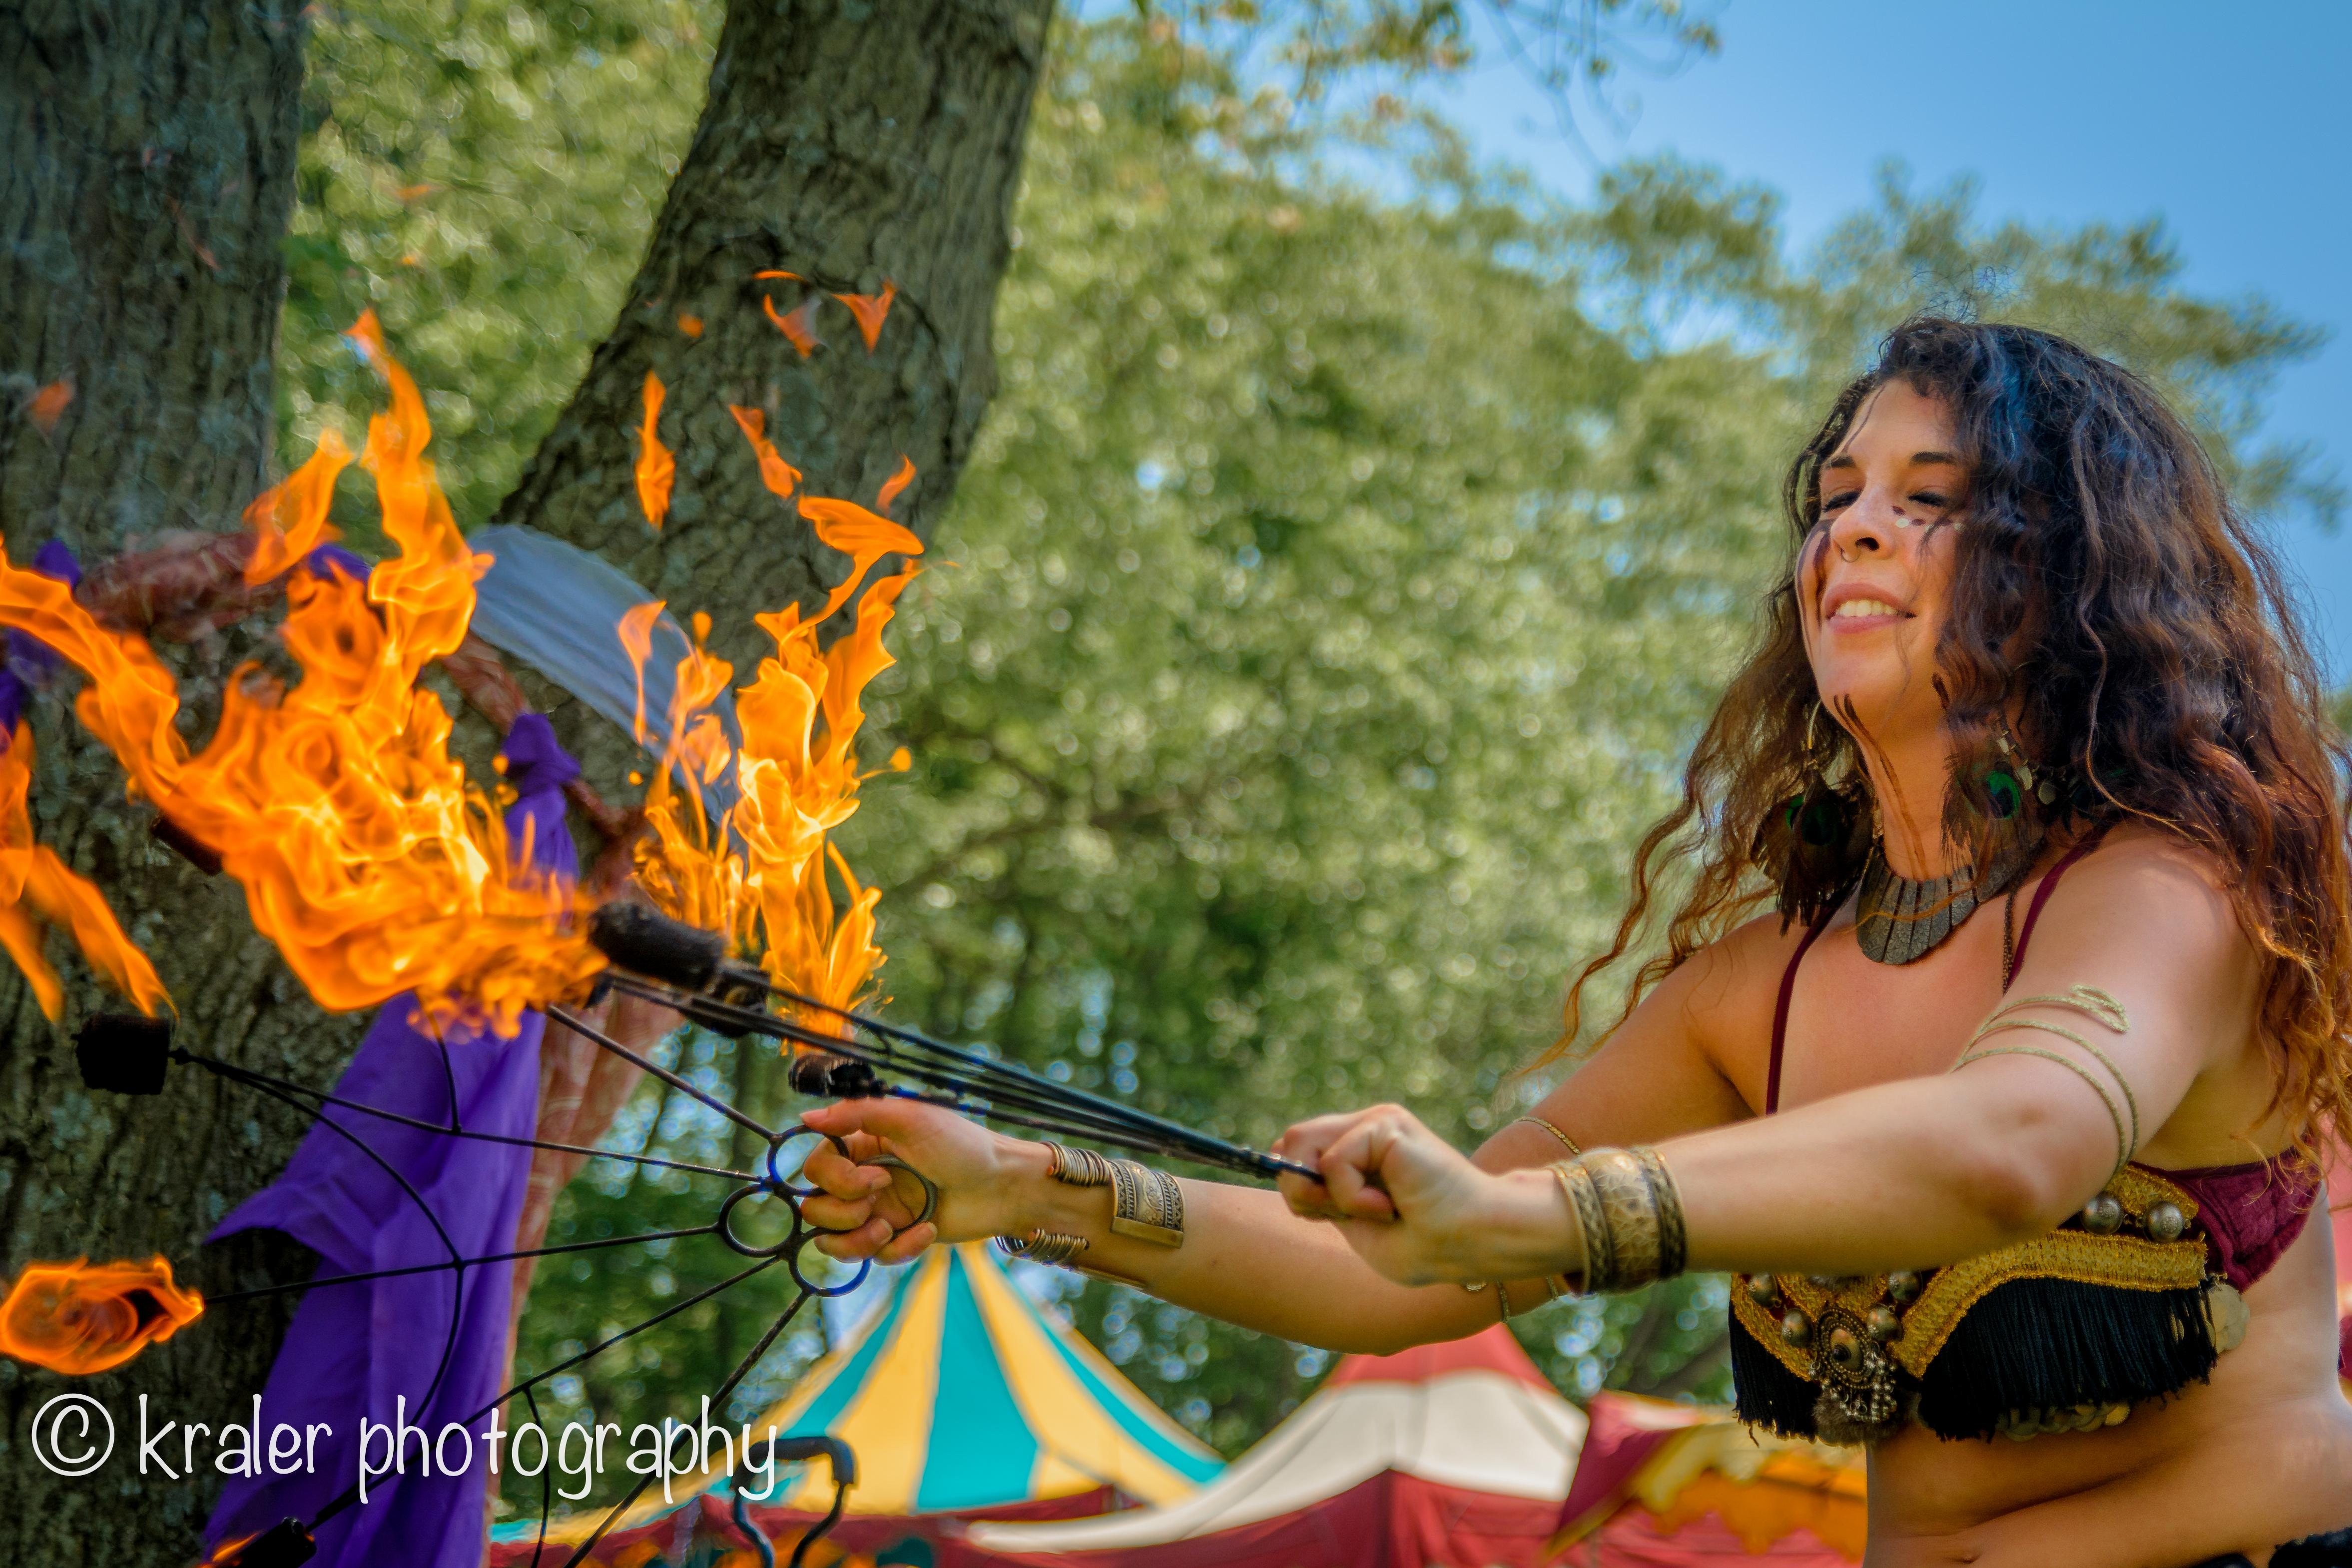 Renaissance Faire10-May 28, 2016